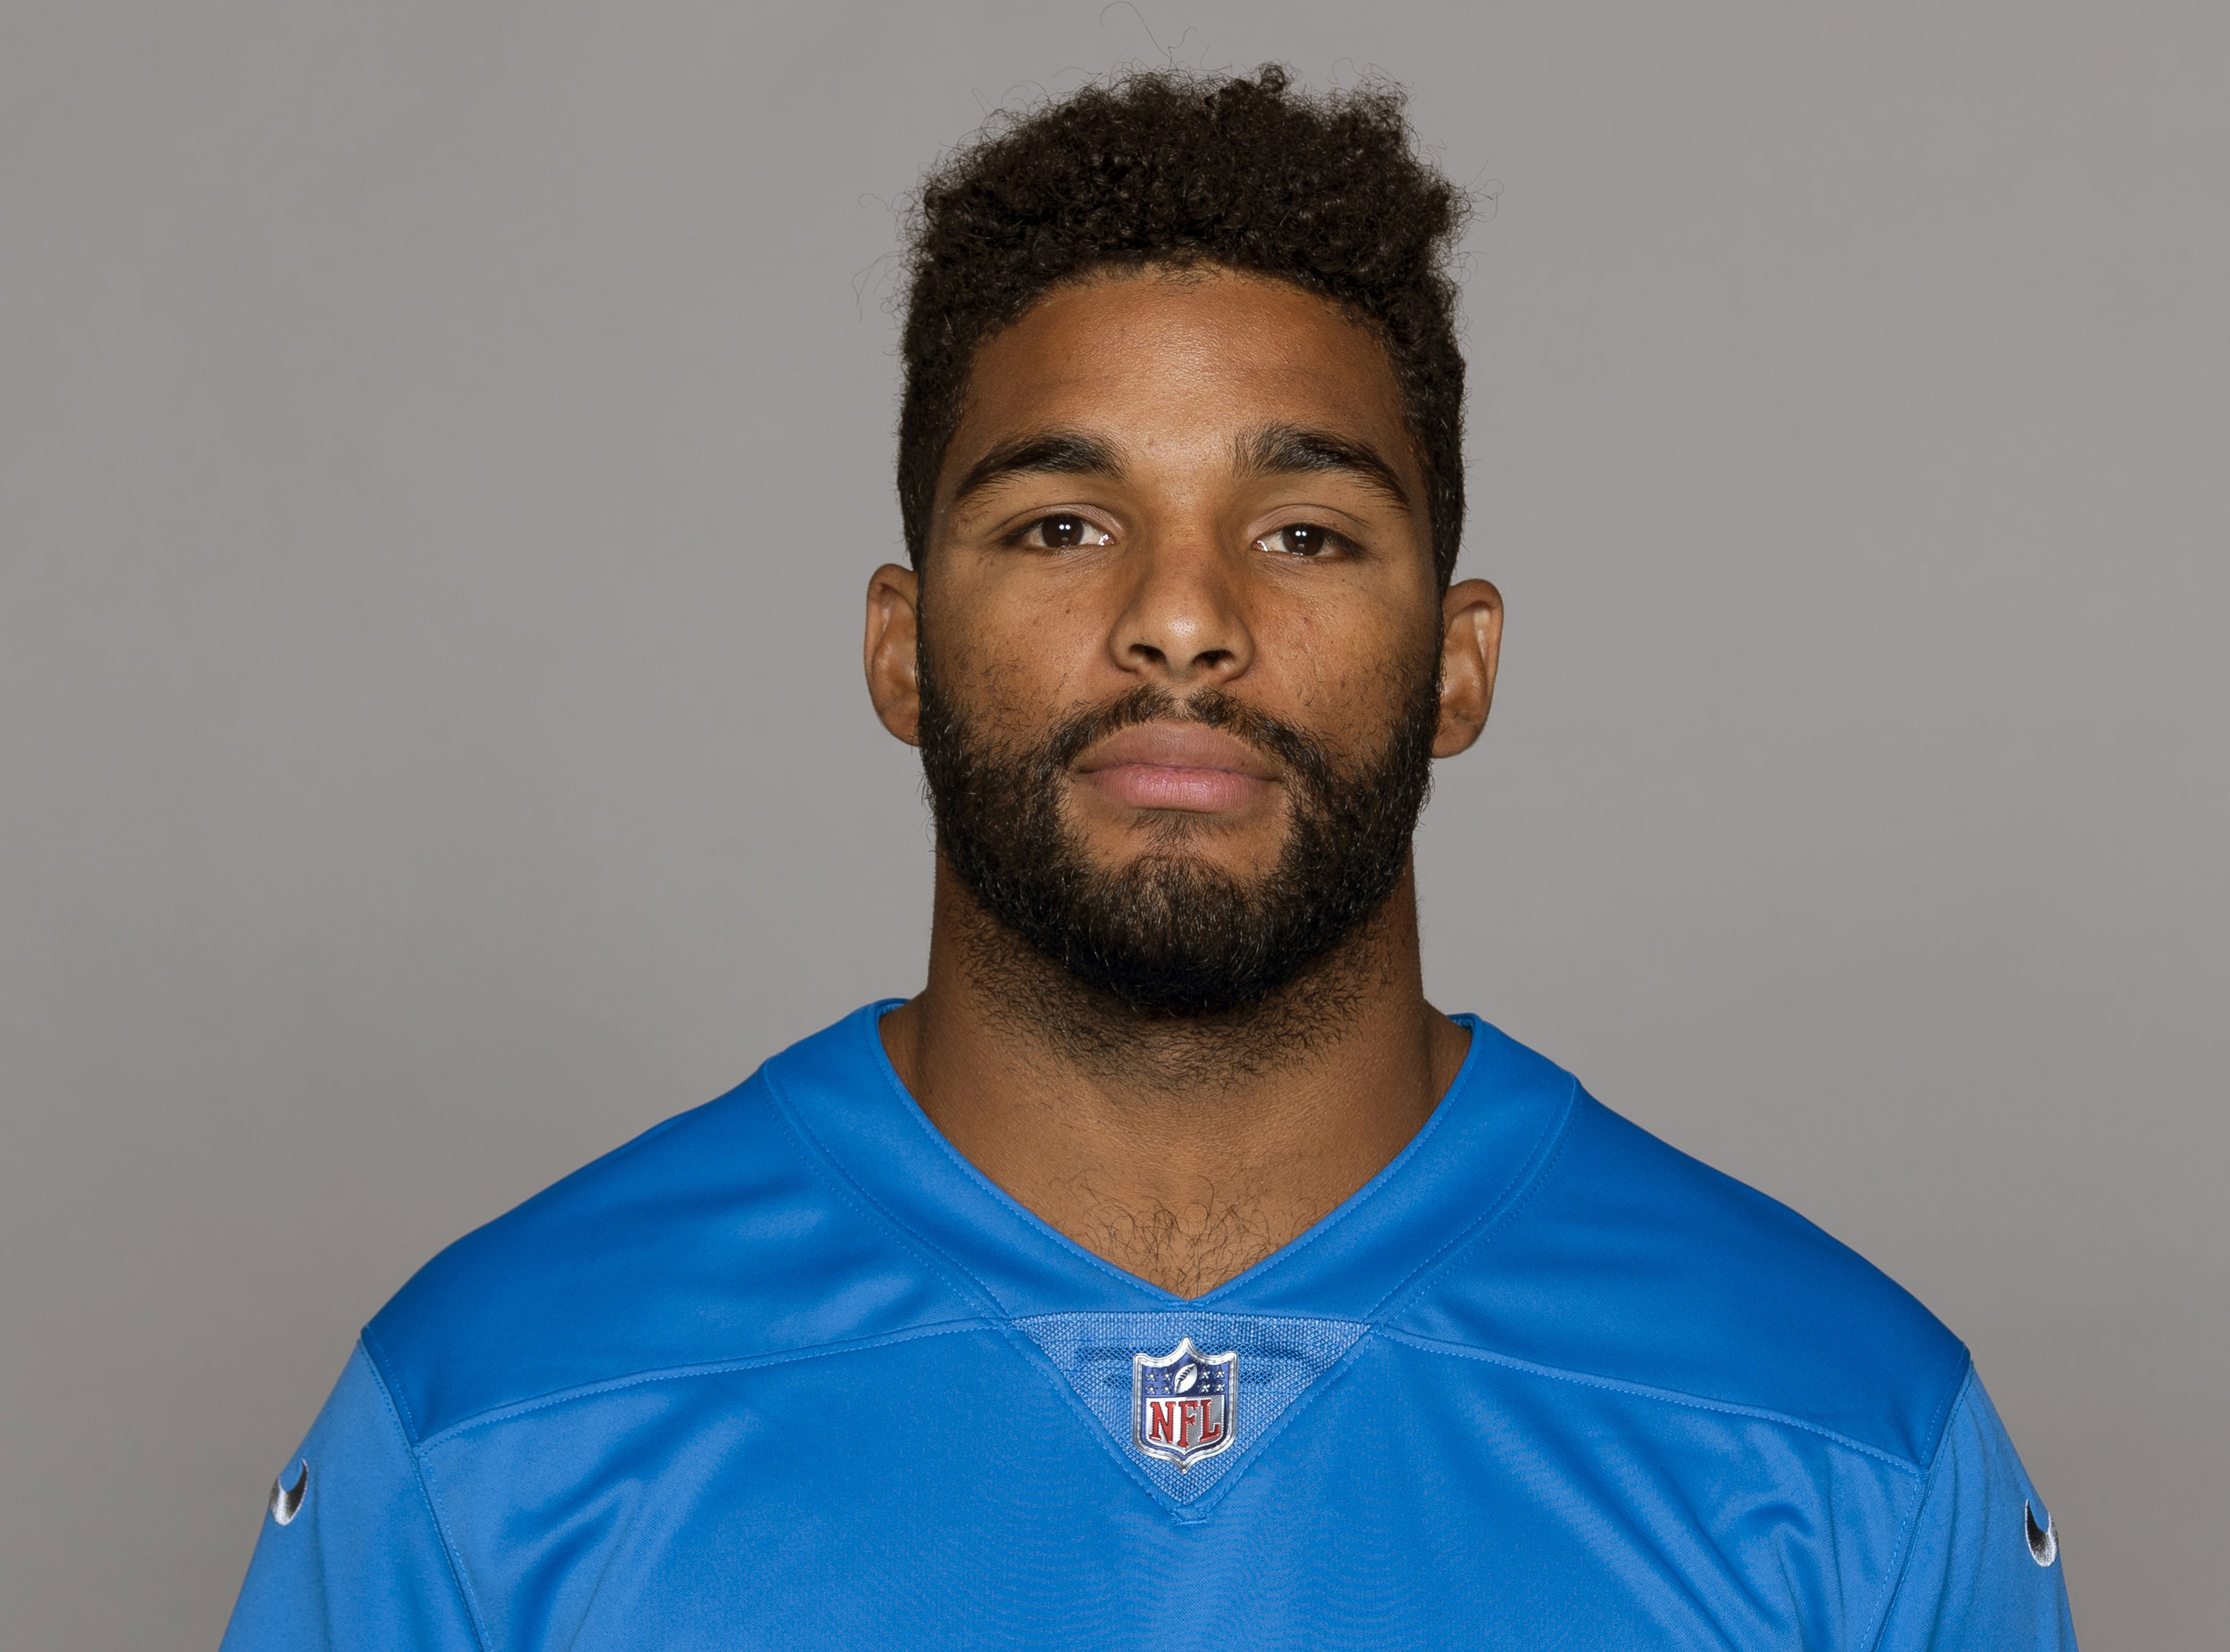 Detroit Lions Linebacker Trevor Bates was arraigned by video conference in Queens Criminal Court. AP Photo